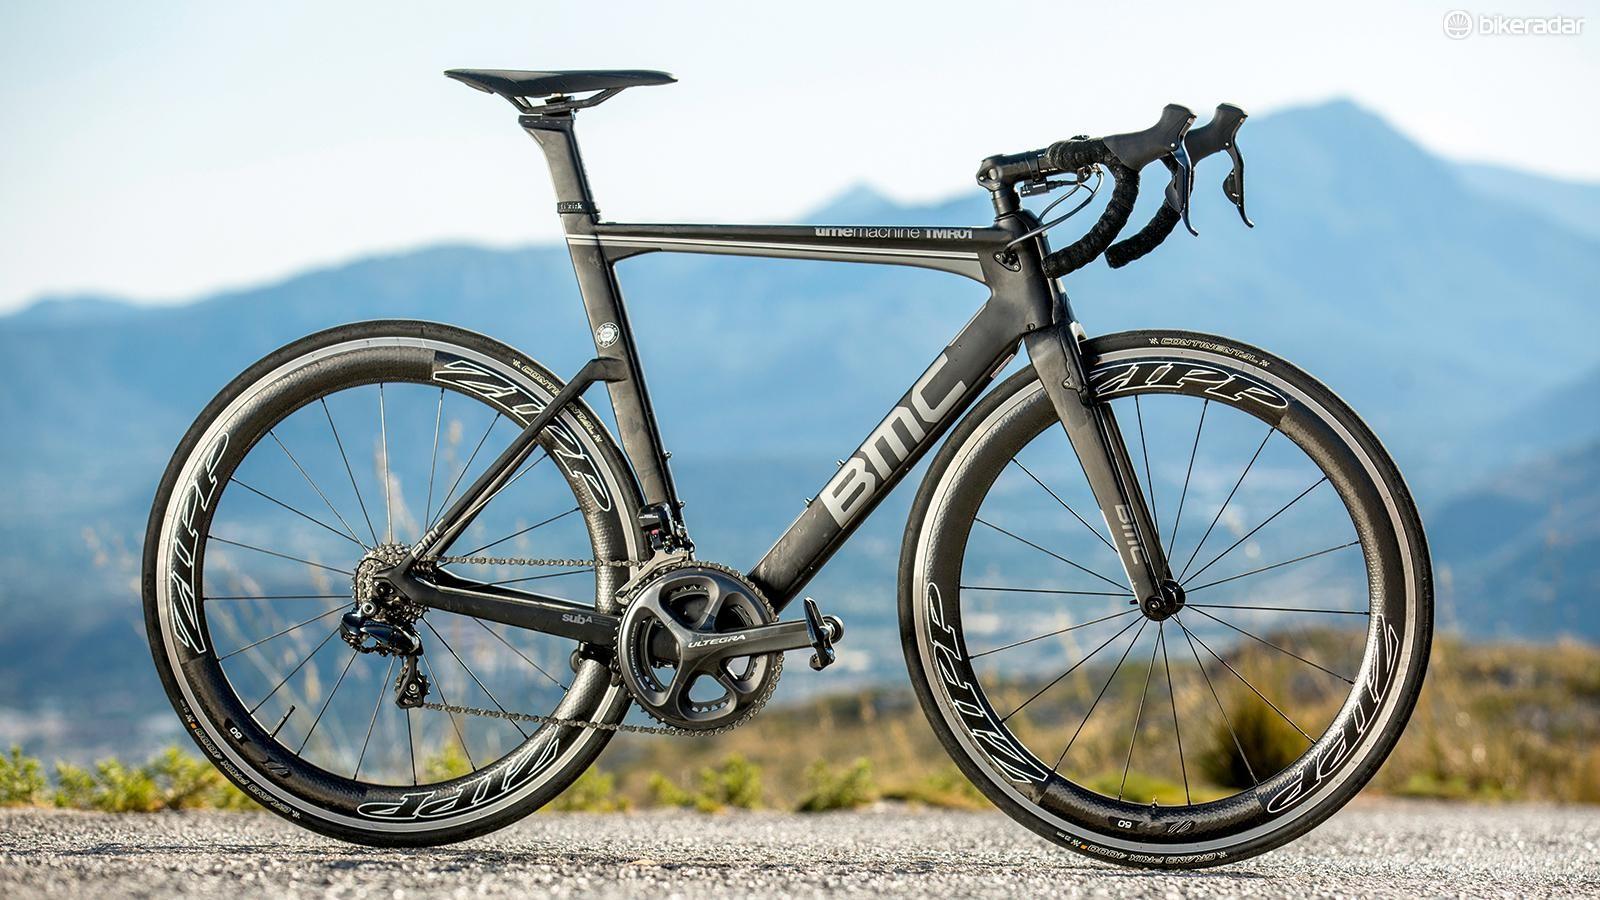 BMC's Aero TMR01 Ultegra Di2 is an uncompromising ride, but a massively rewarding one